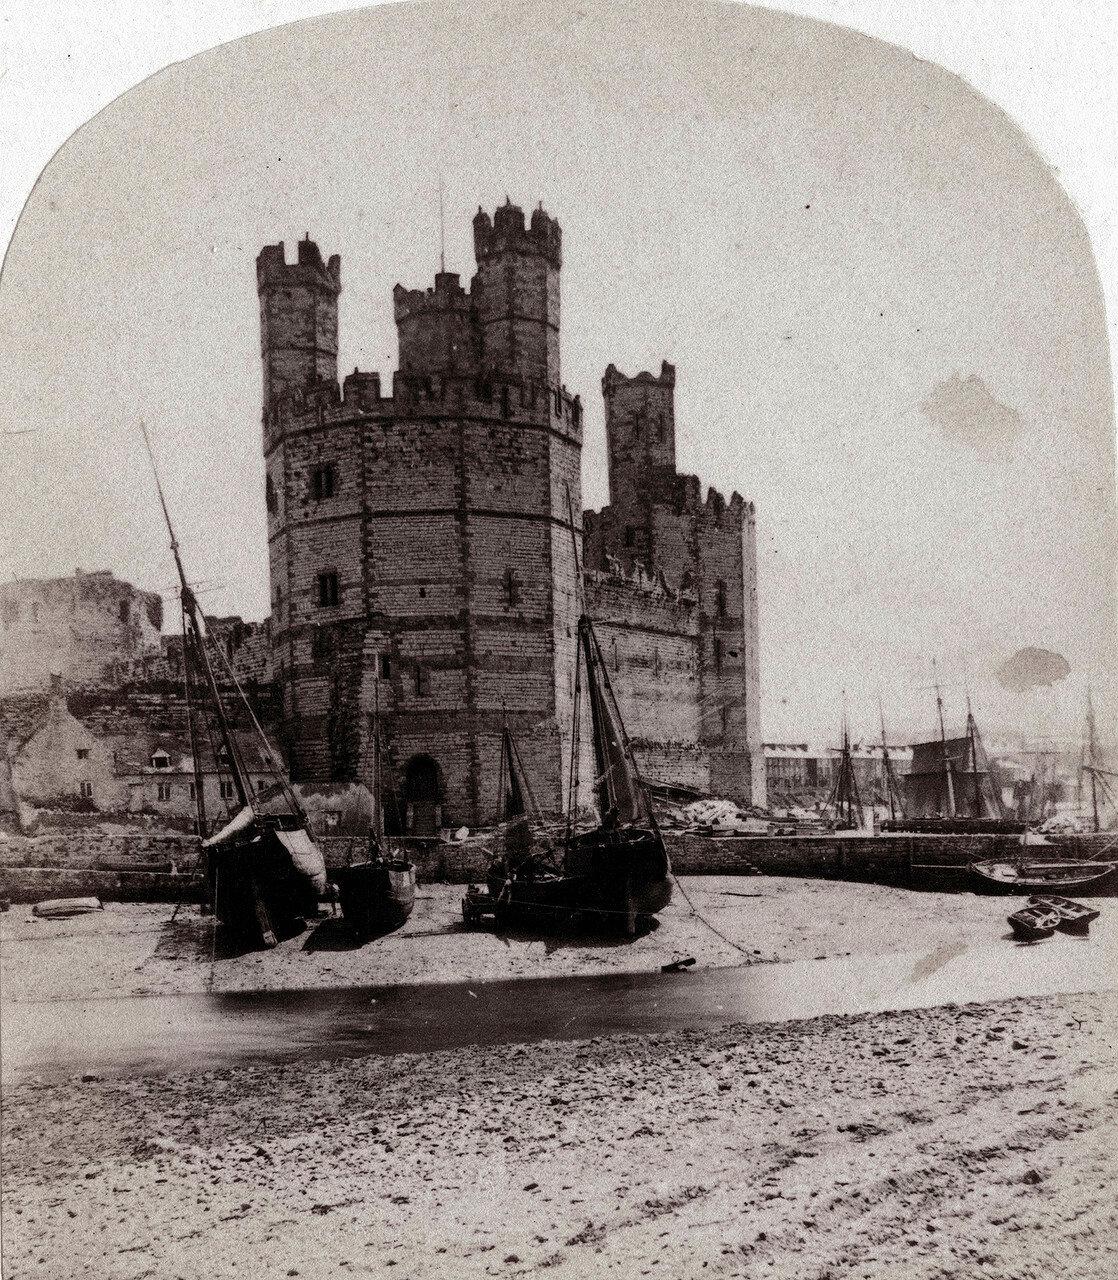 Замок Карнарвон. Великобритания, 1864